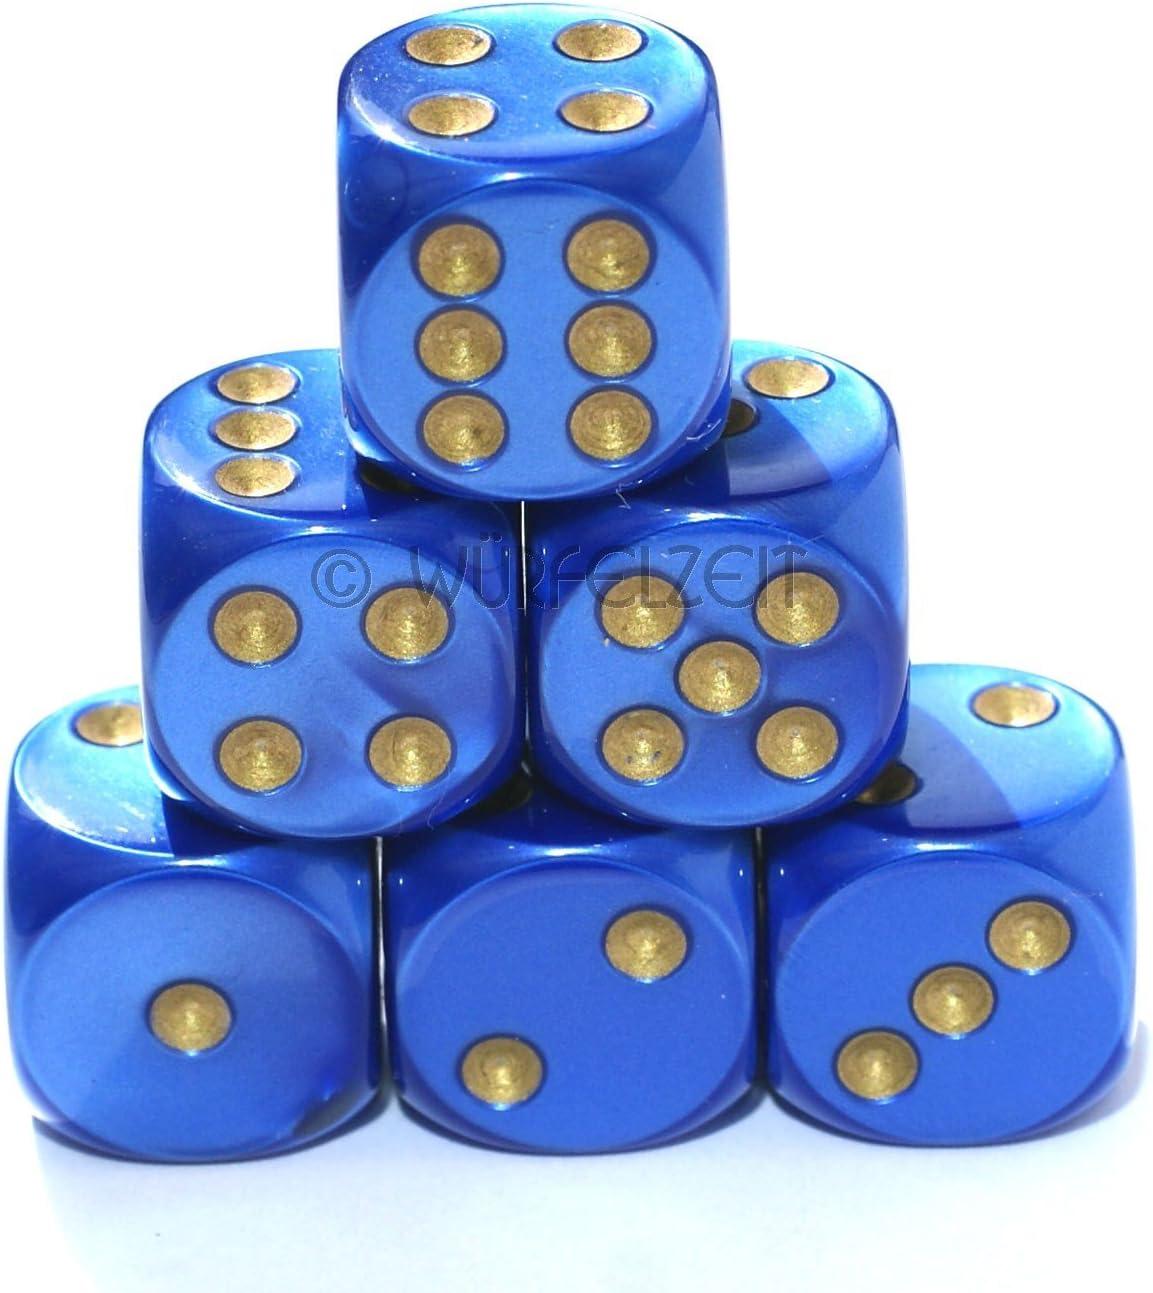 W/ürfelzeit 7453 Silkki blau m//Gold W/ürfel w6 16 mm 12er Set im Polybeutel